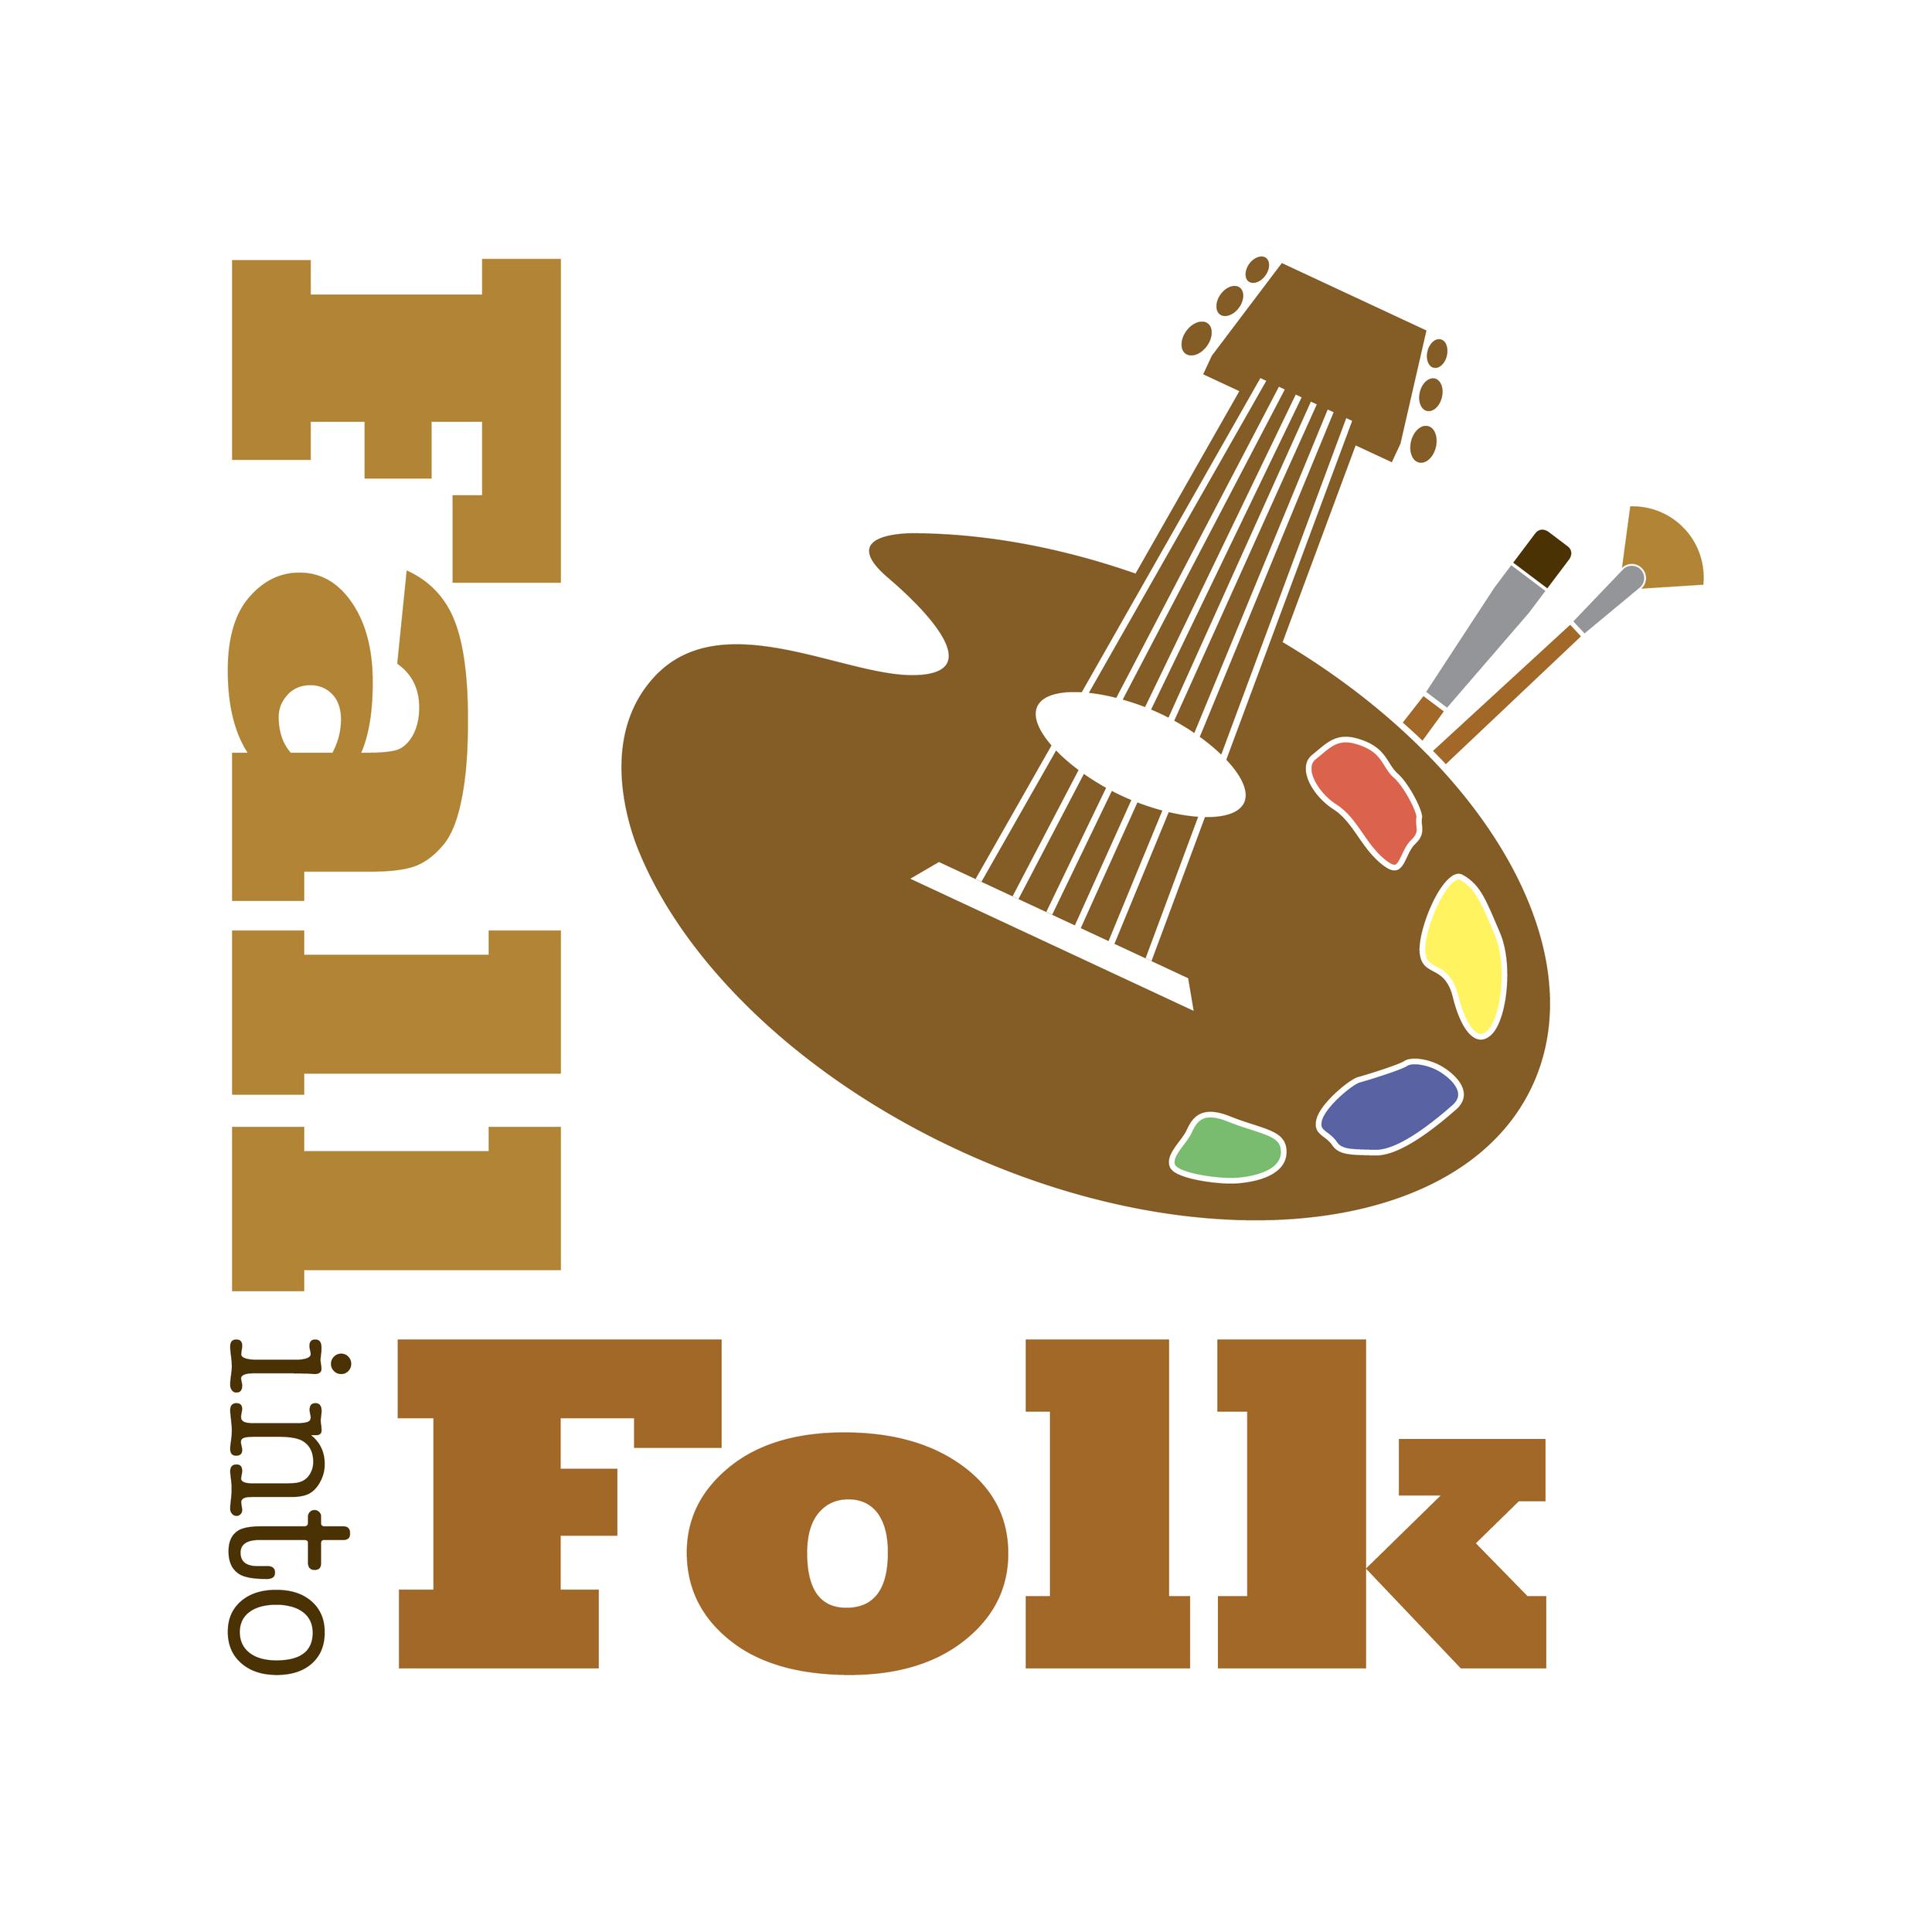 Fall into Folk